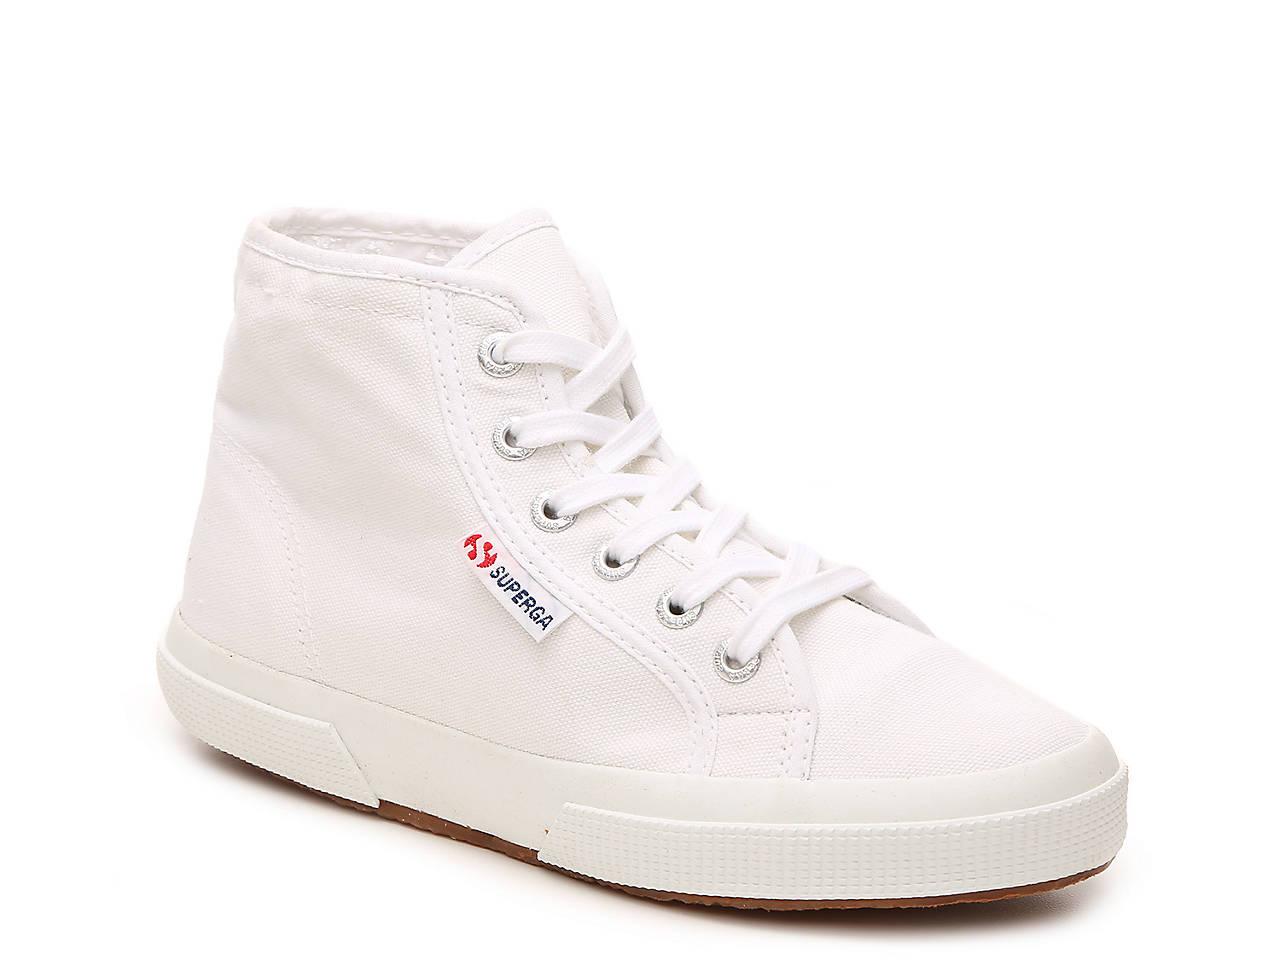 eac4a05cef65 Superga 2095 Canvas High-Top Sneaker Women s Shoes